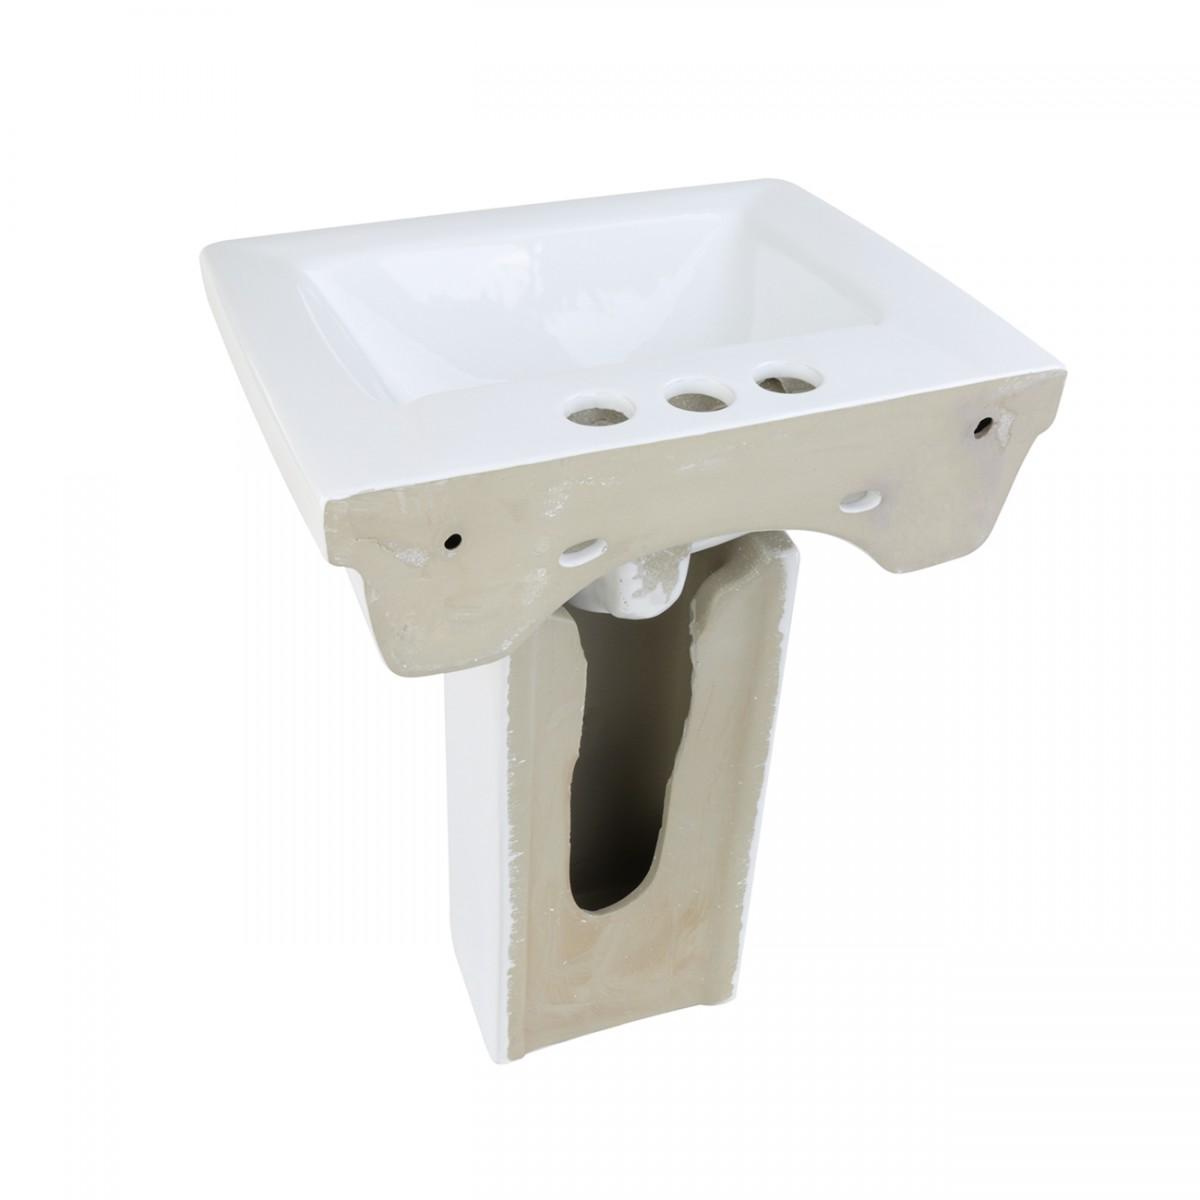 Renovators Supply White Bathroom Pedestal Sink 4 Centerset for Children White Washroom Pedestal Sink Childrens sink small pedestal sink